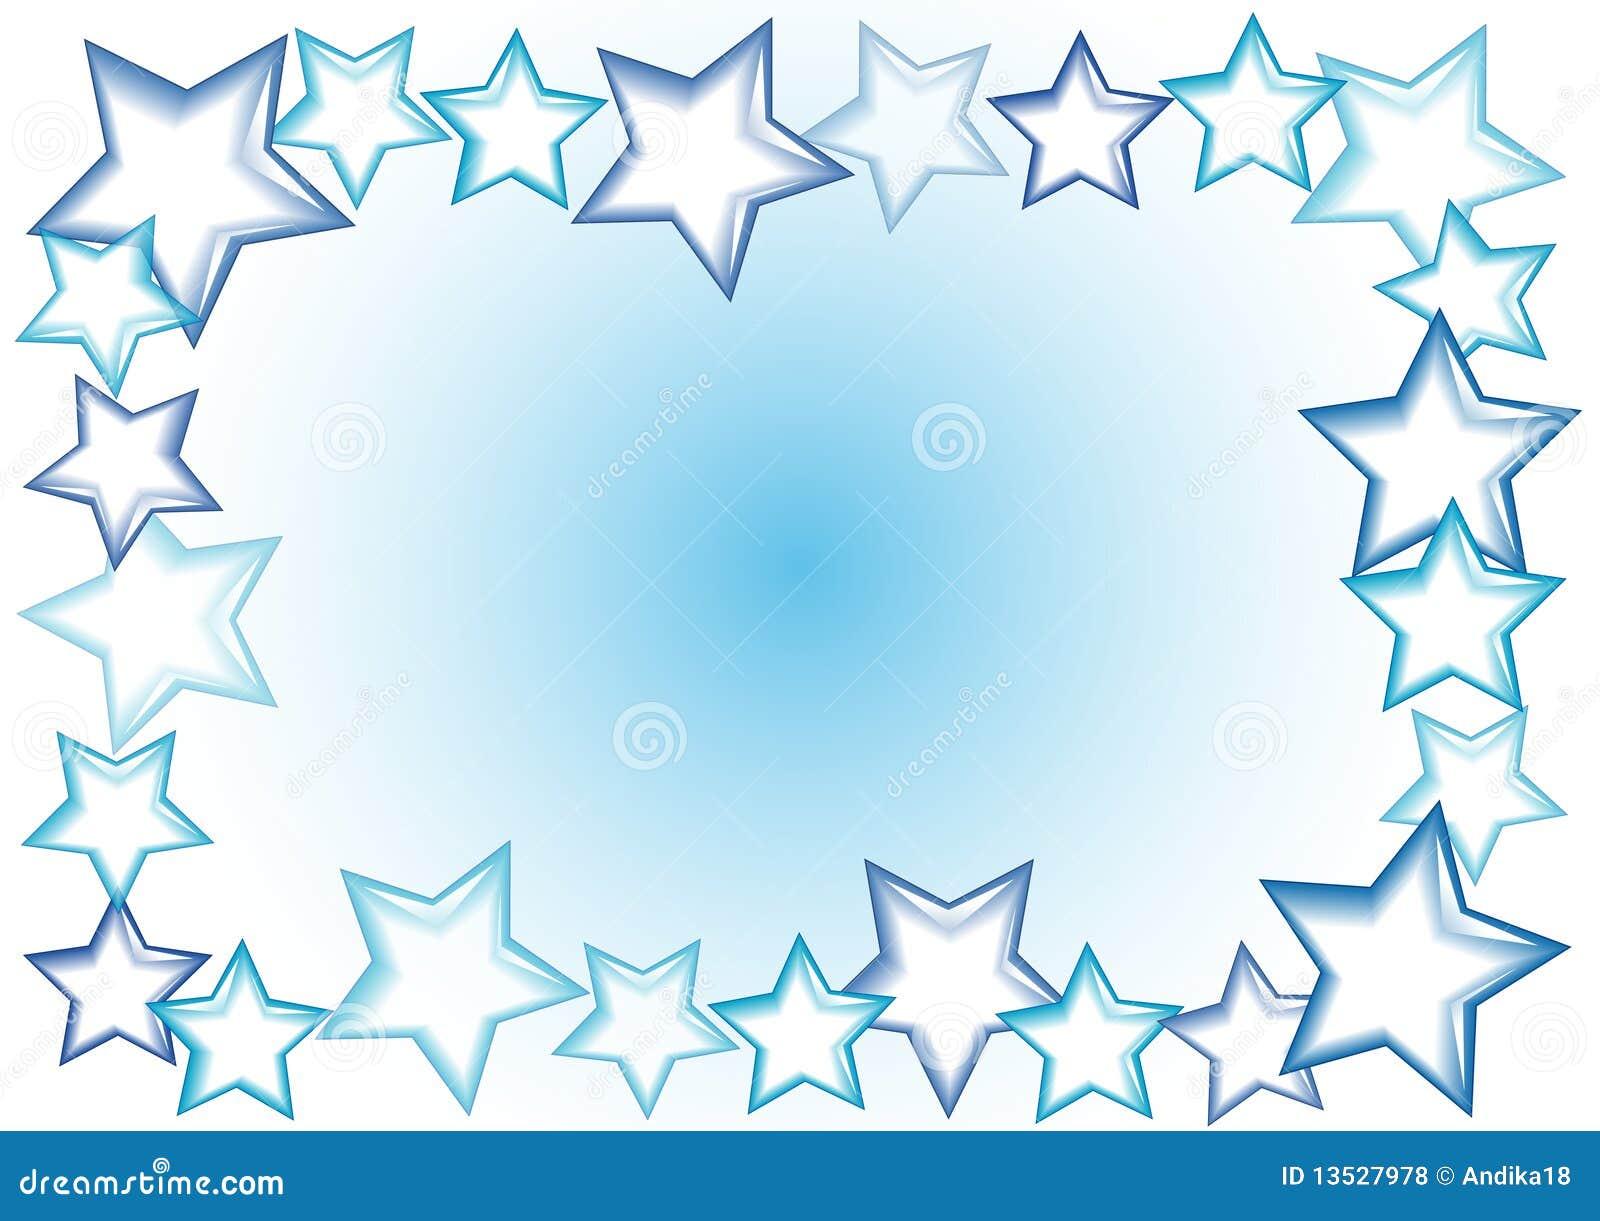 Star frame stock illustration. Illustration of card, celebration ...